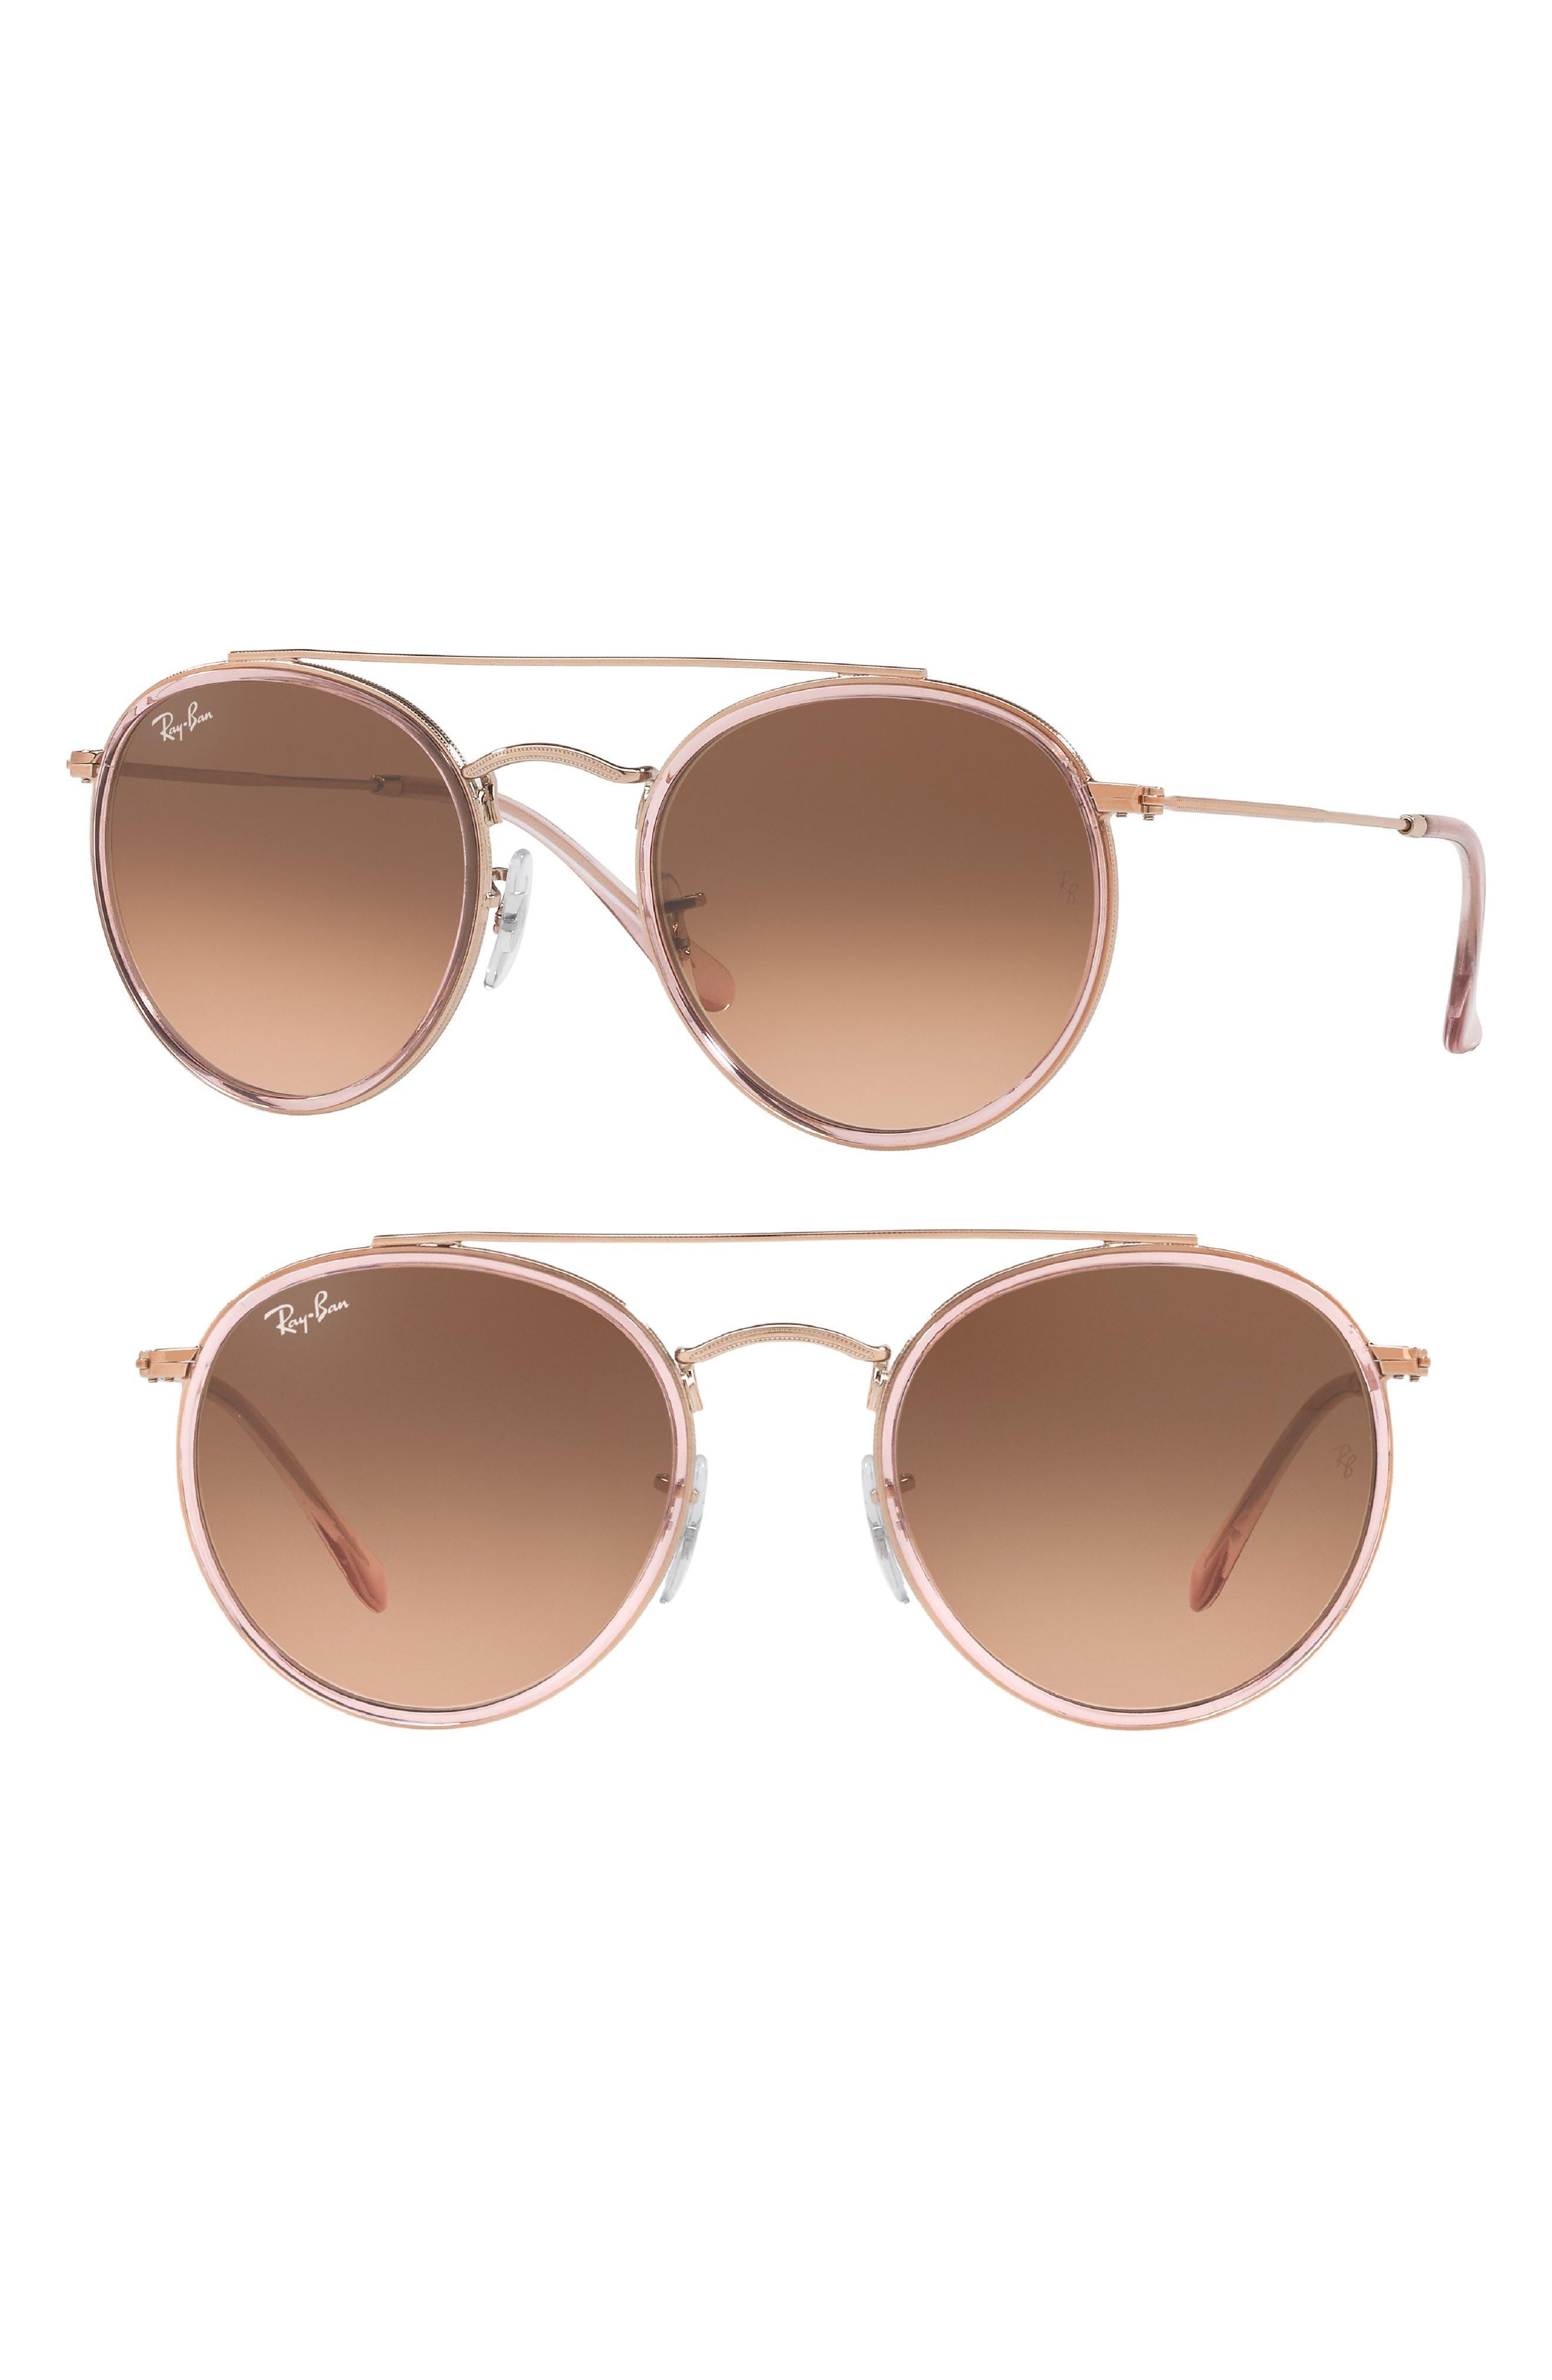 51mm Aviator Gradient Lens Sunglasses,                             Main thumbnail 4, color,